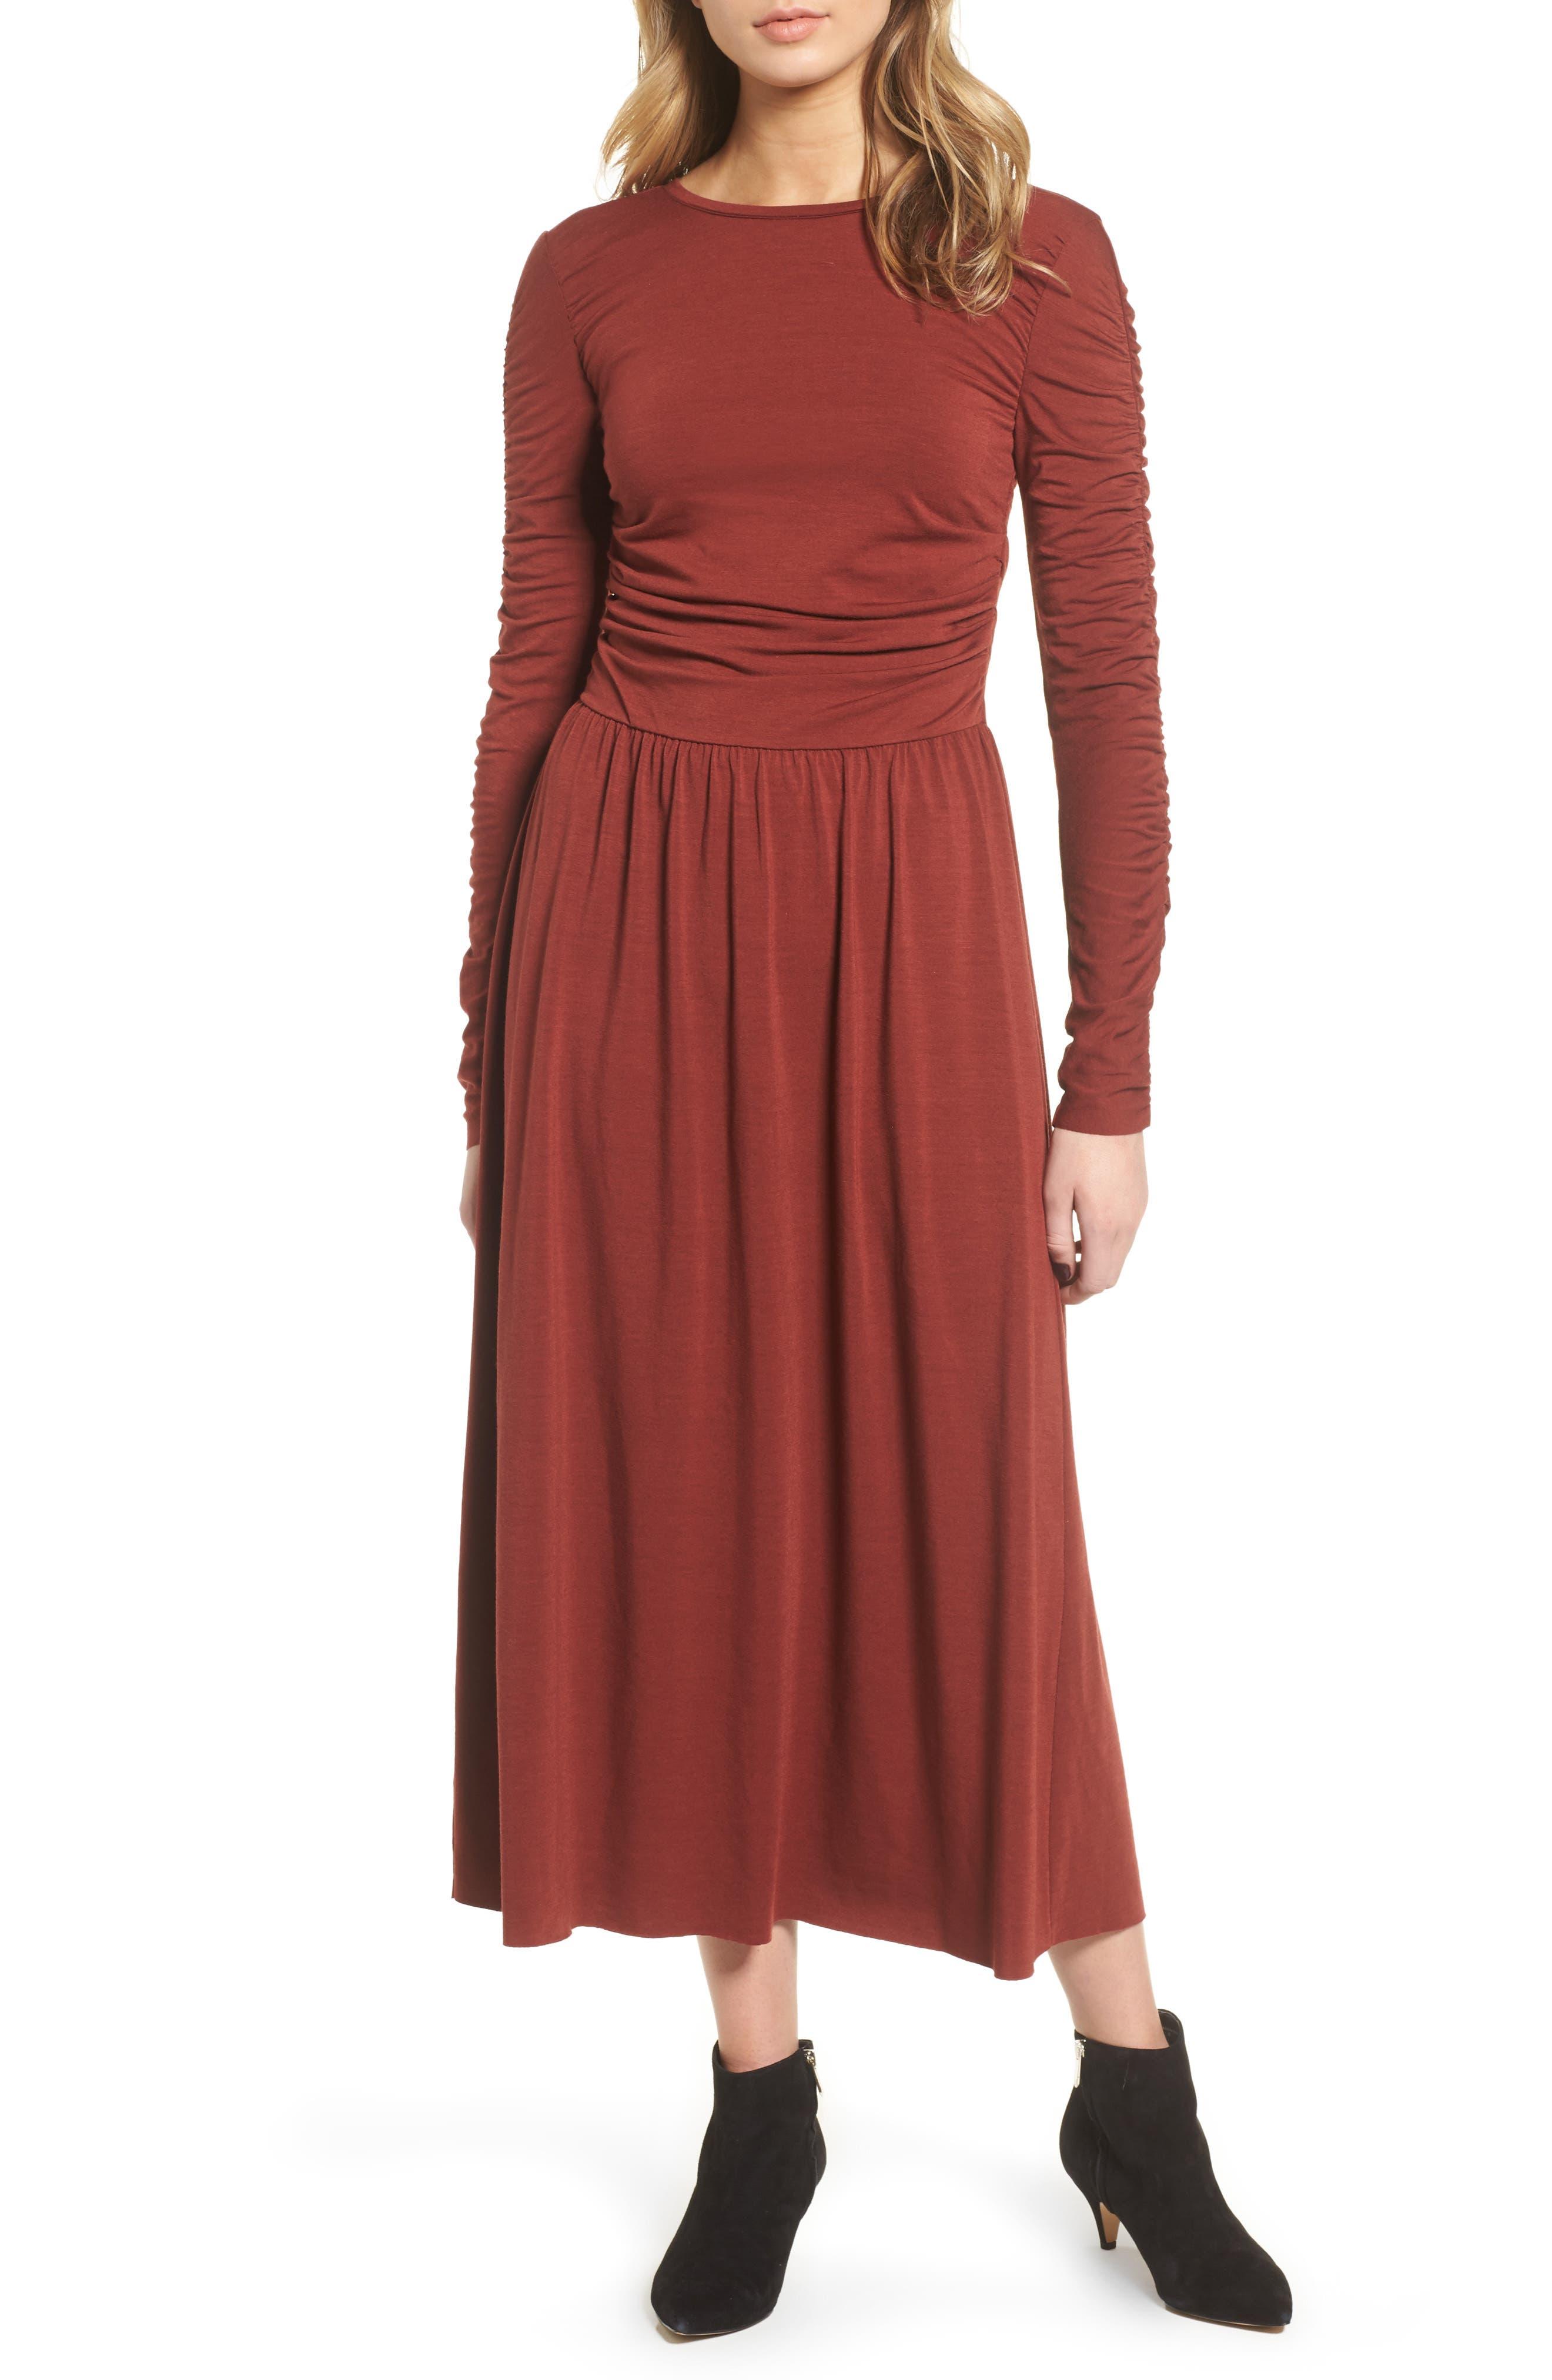 Main Image - Treasure & Bond Ruched Jersey Knit Dress